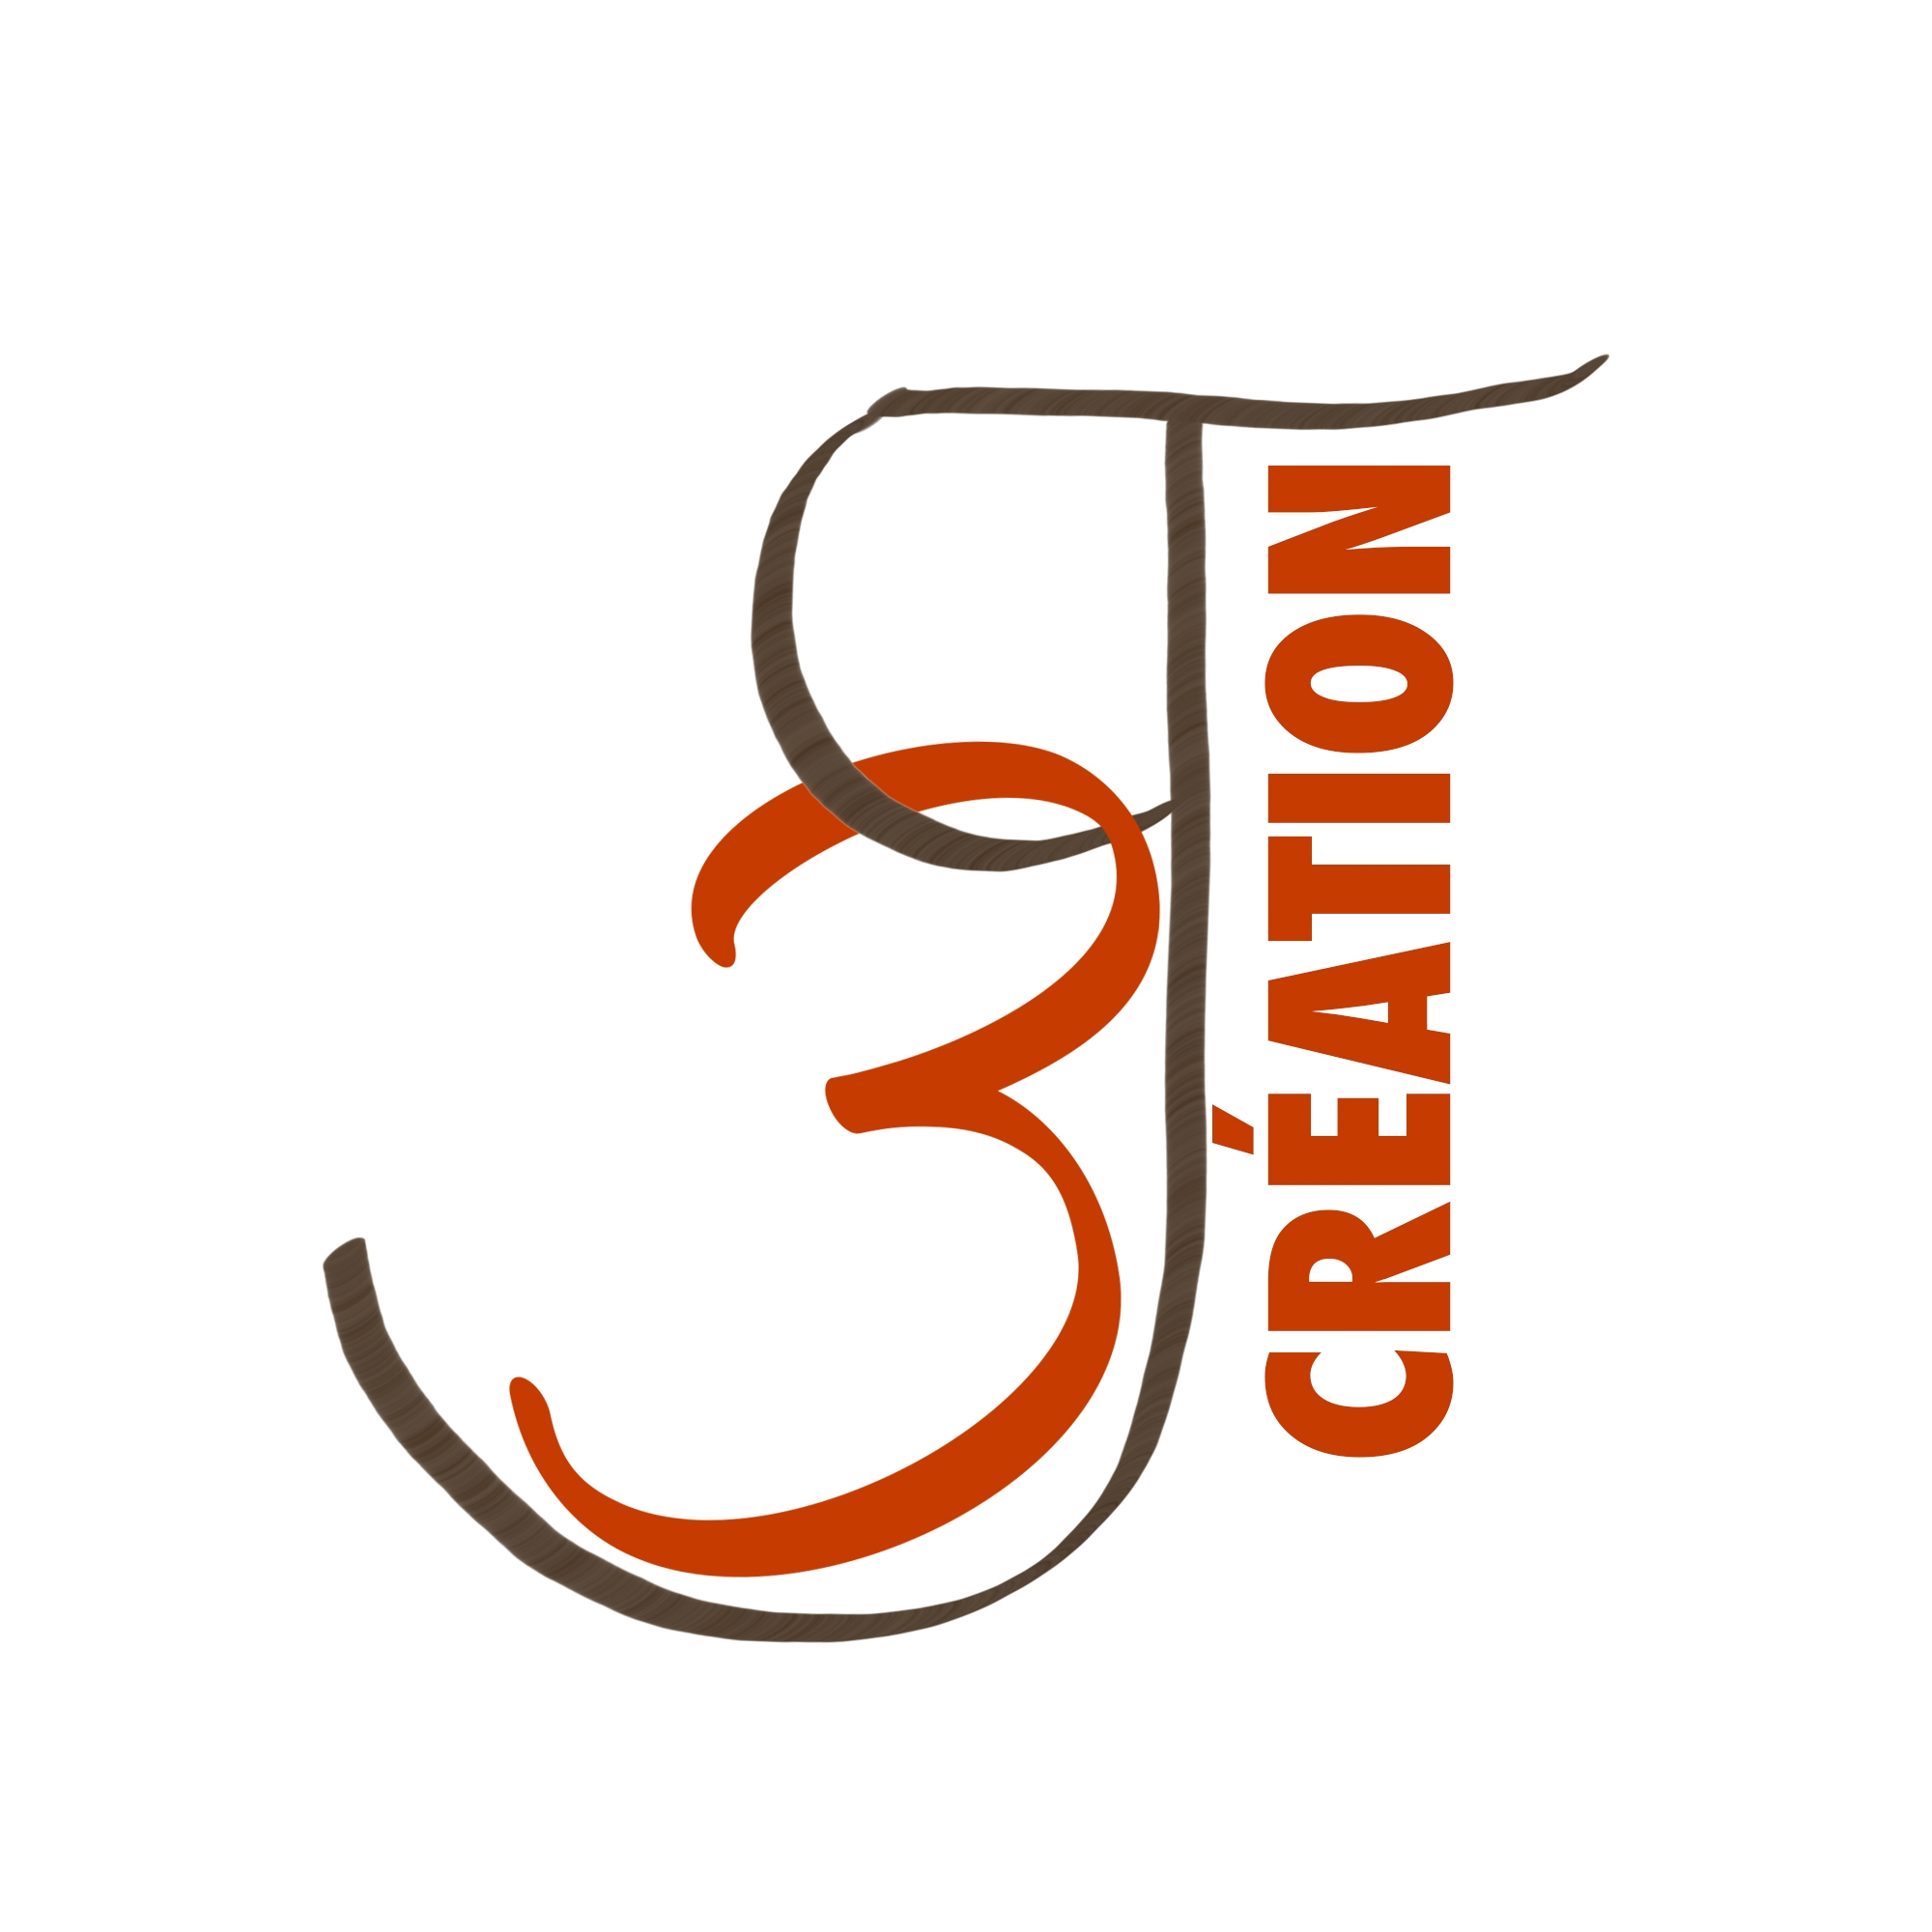 Logo Vf Jpg